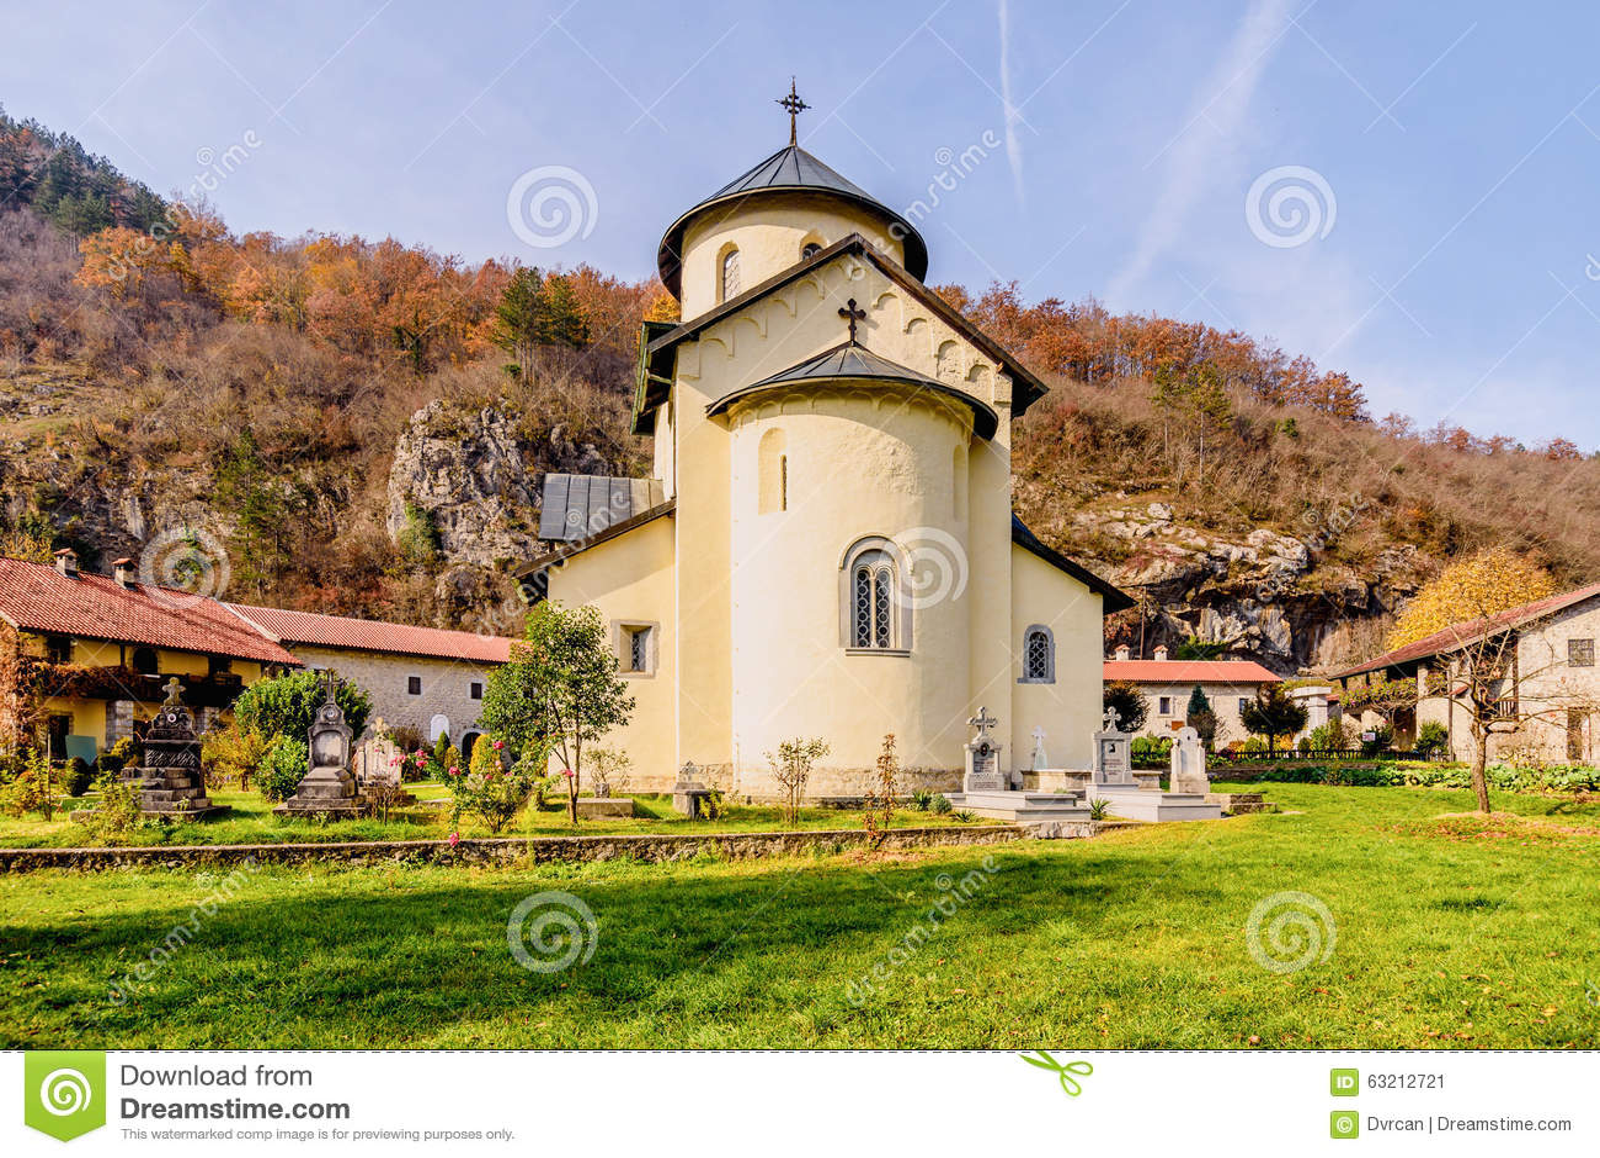 Serbian Orthodox Monastery Moraca, Kolasin,Montenegro